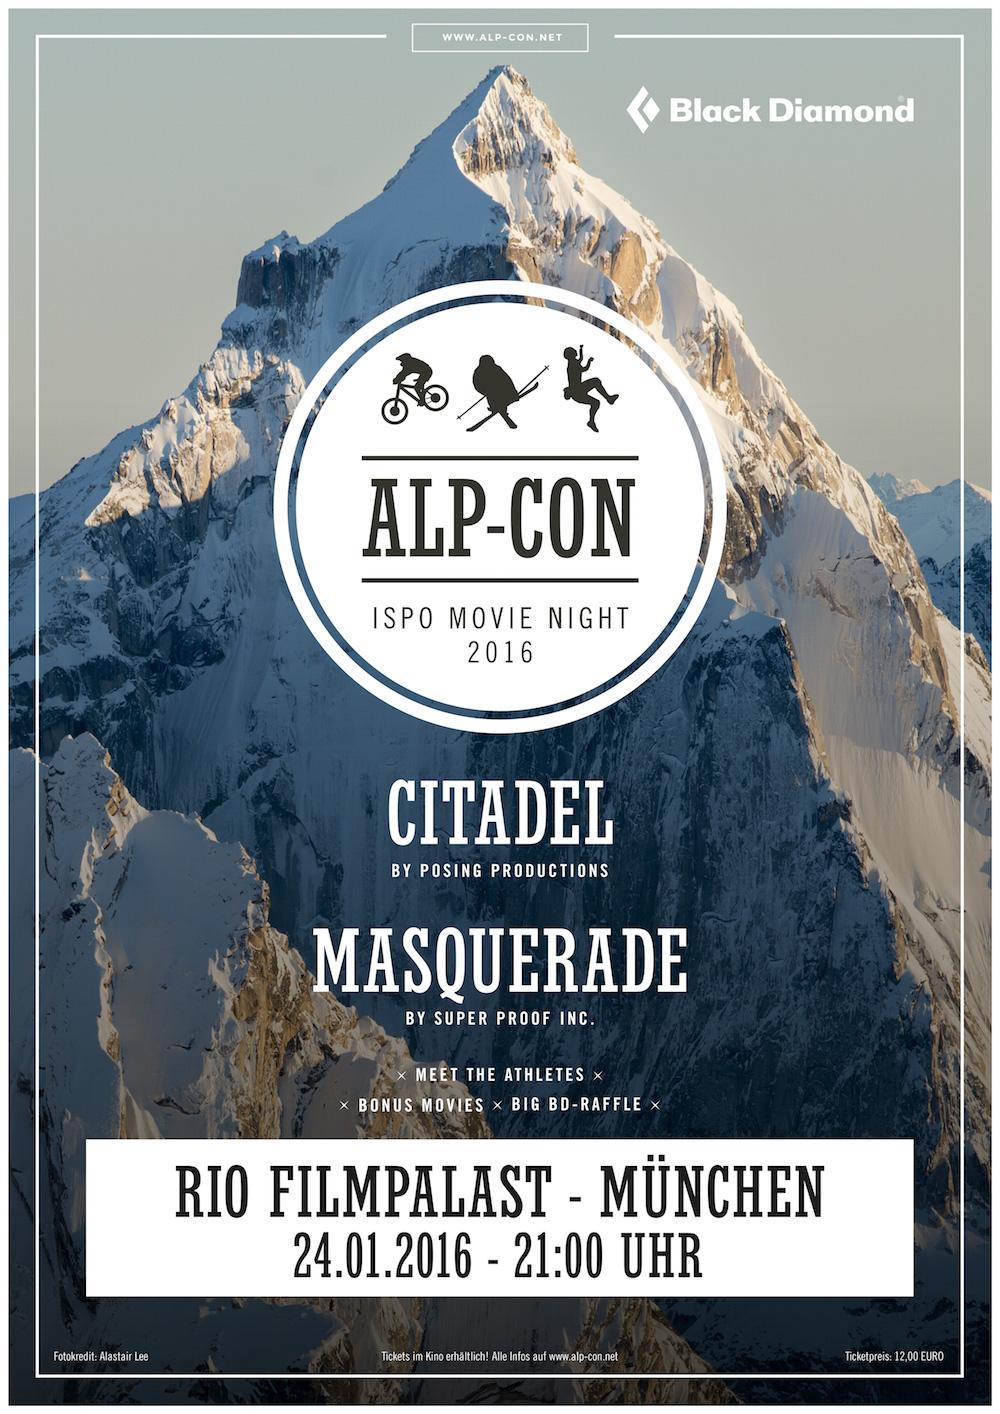 BD_MovieNight_Poster_REF